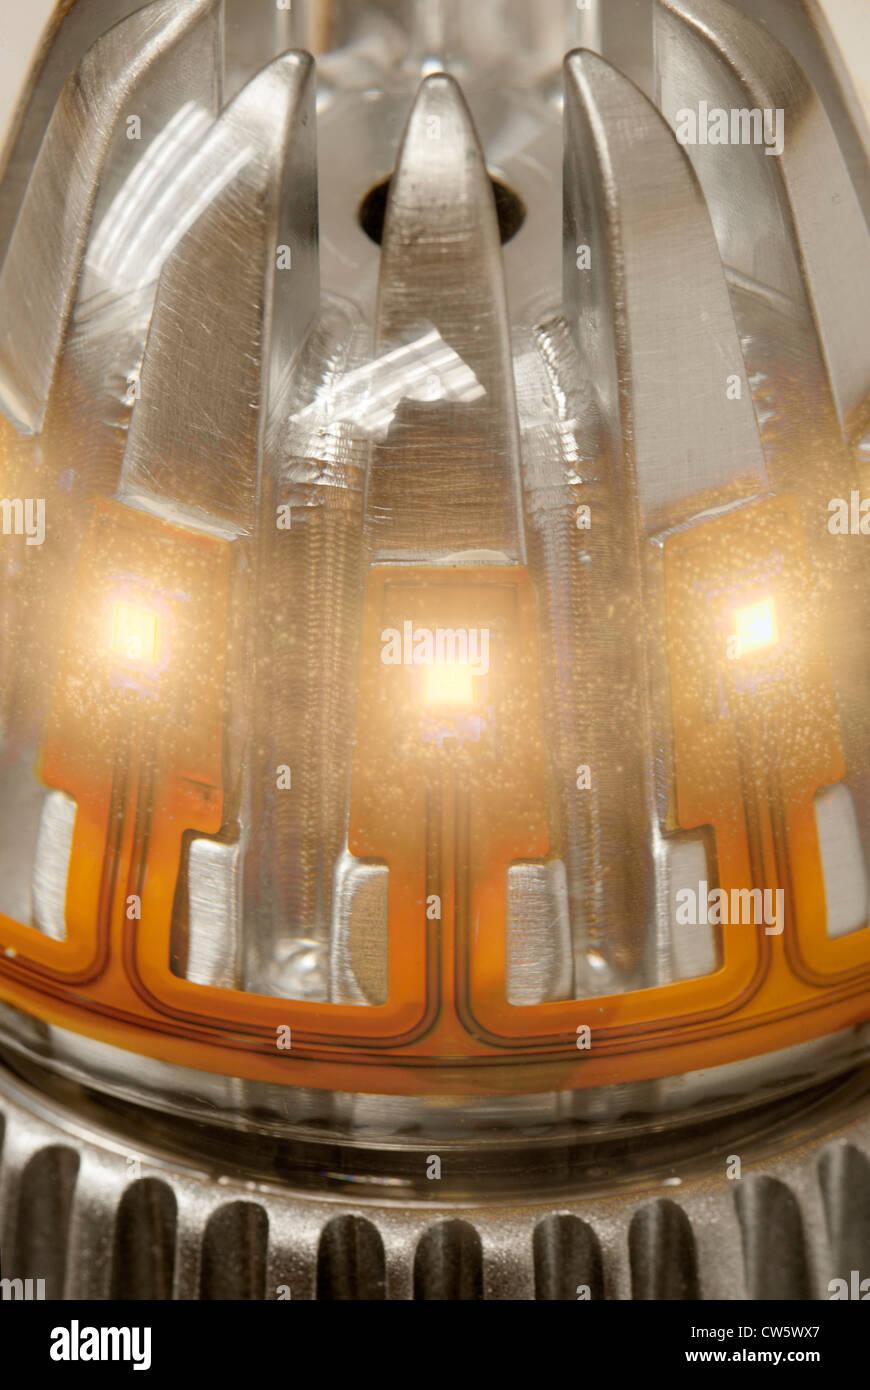 Interruttore luce a LED lampadina, interruttore lab, San Jose California. Immagini Stock